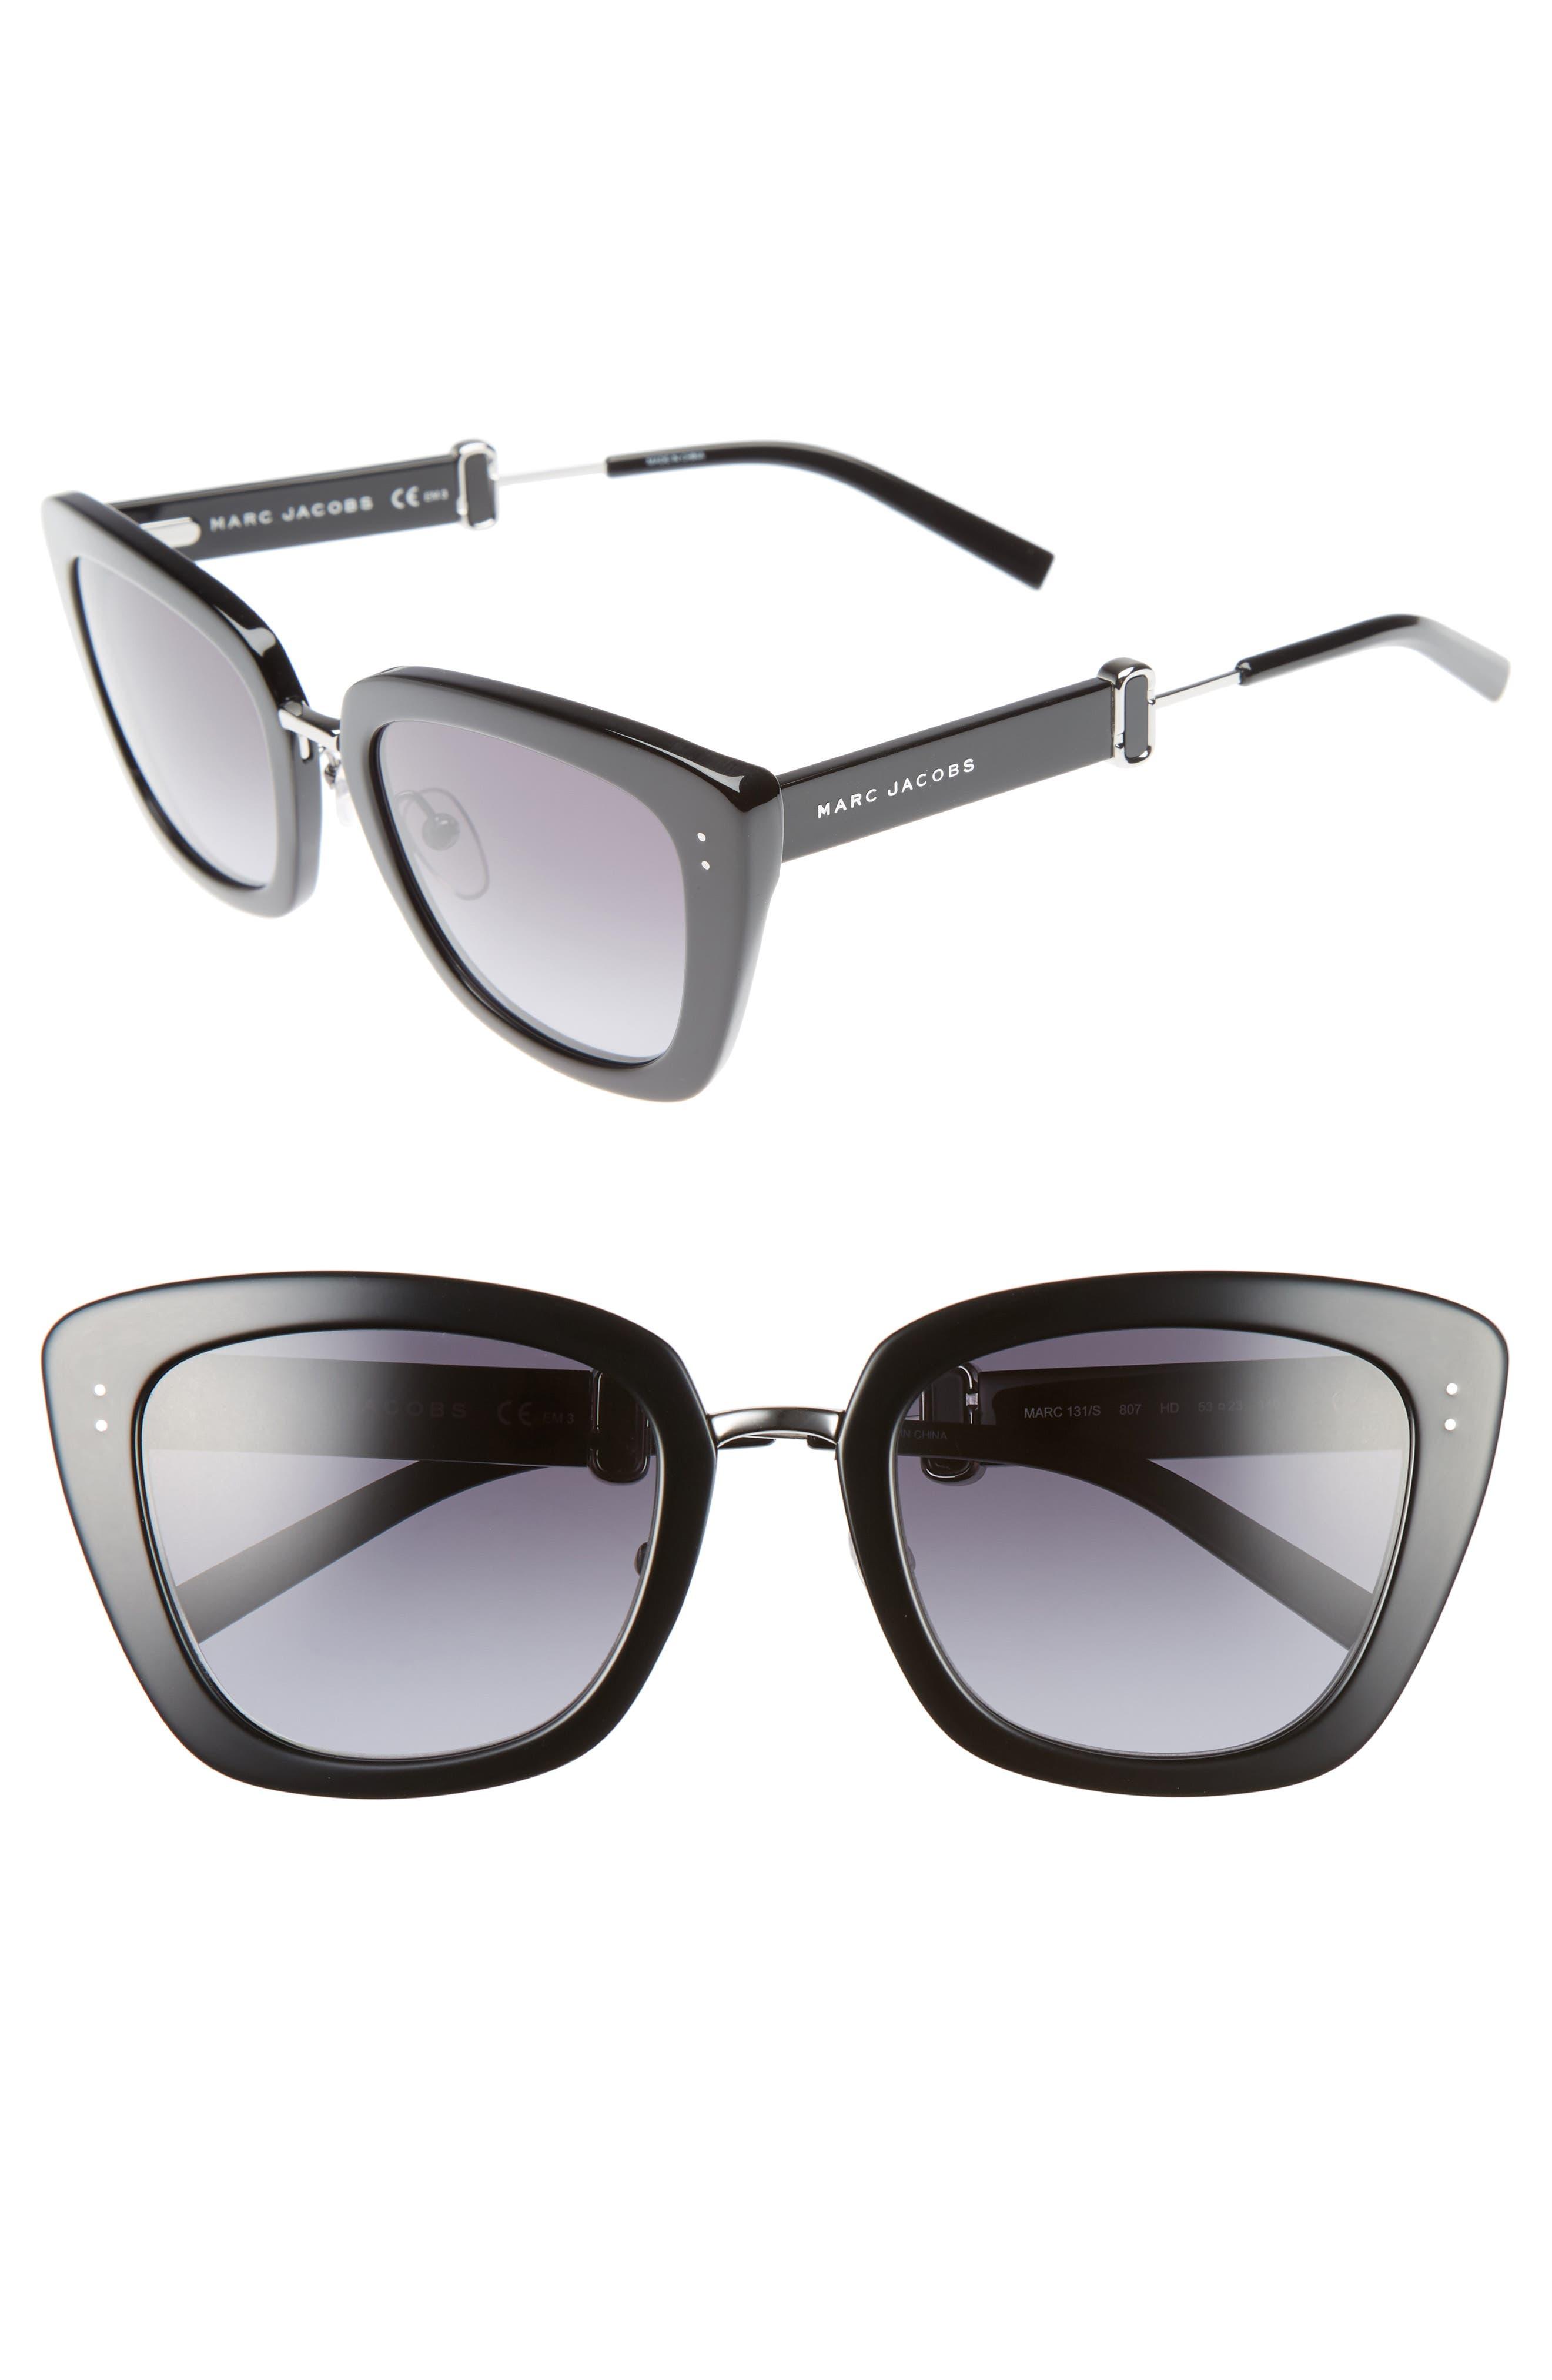 53mm Oversized Sunglasses,                             Main thumbnail 1, color,                             Black